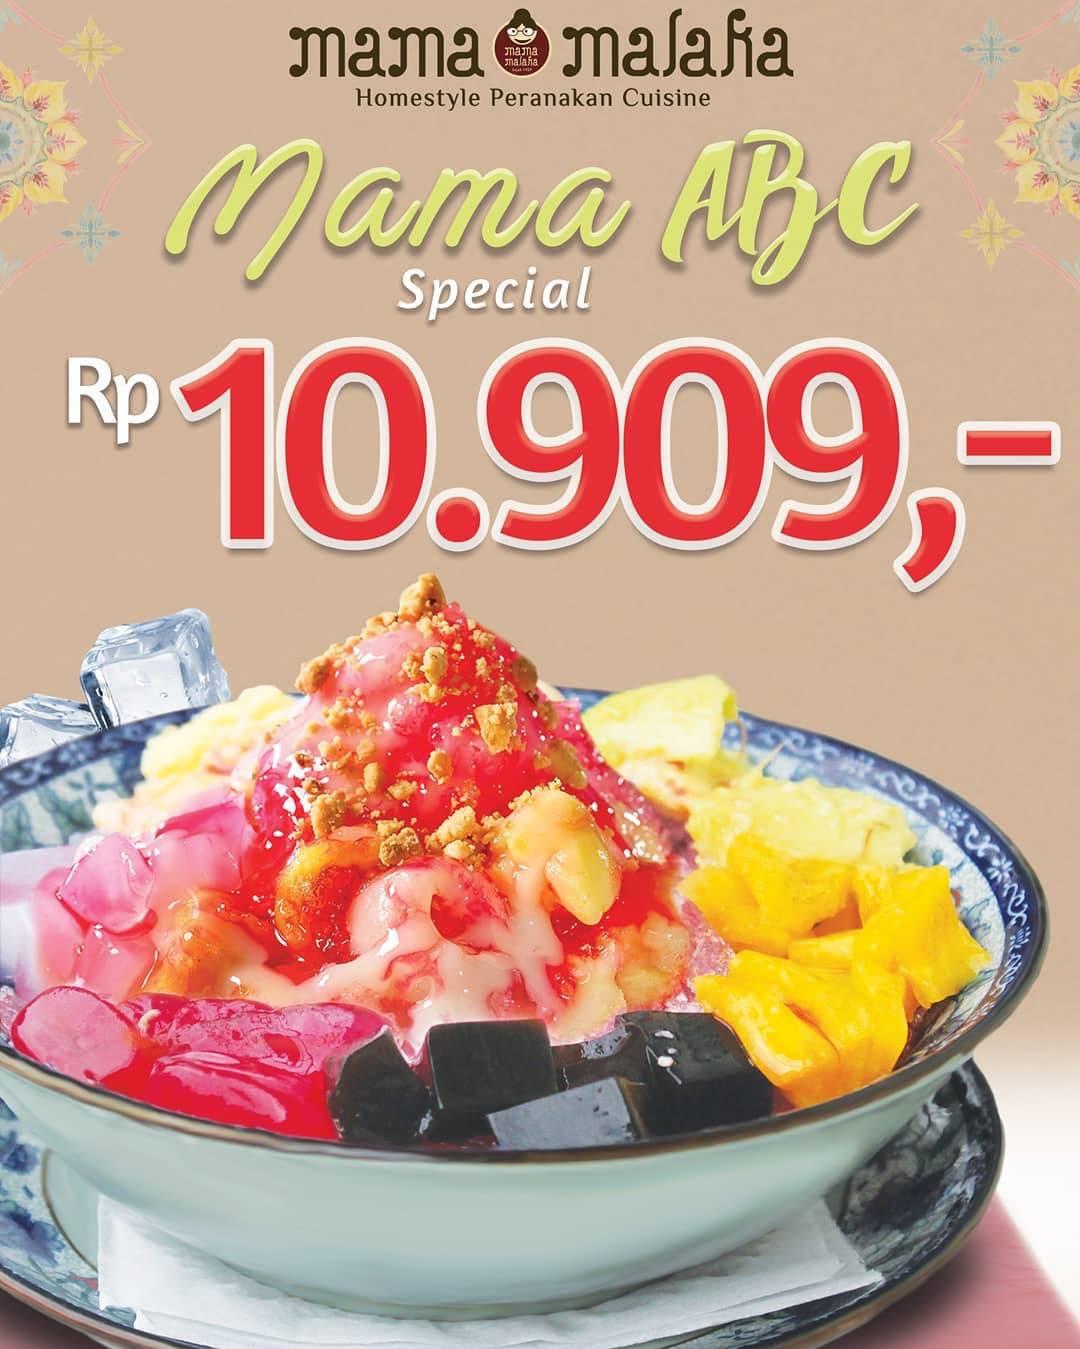 Diskon MAMA MALAKA Promo Special Price Rp. 10.909* untuk Menu Mama ABC